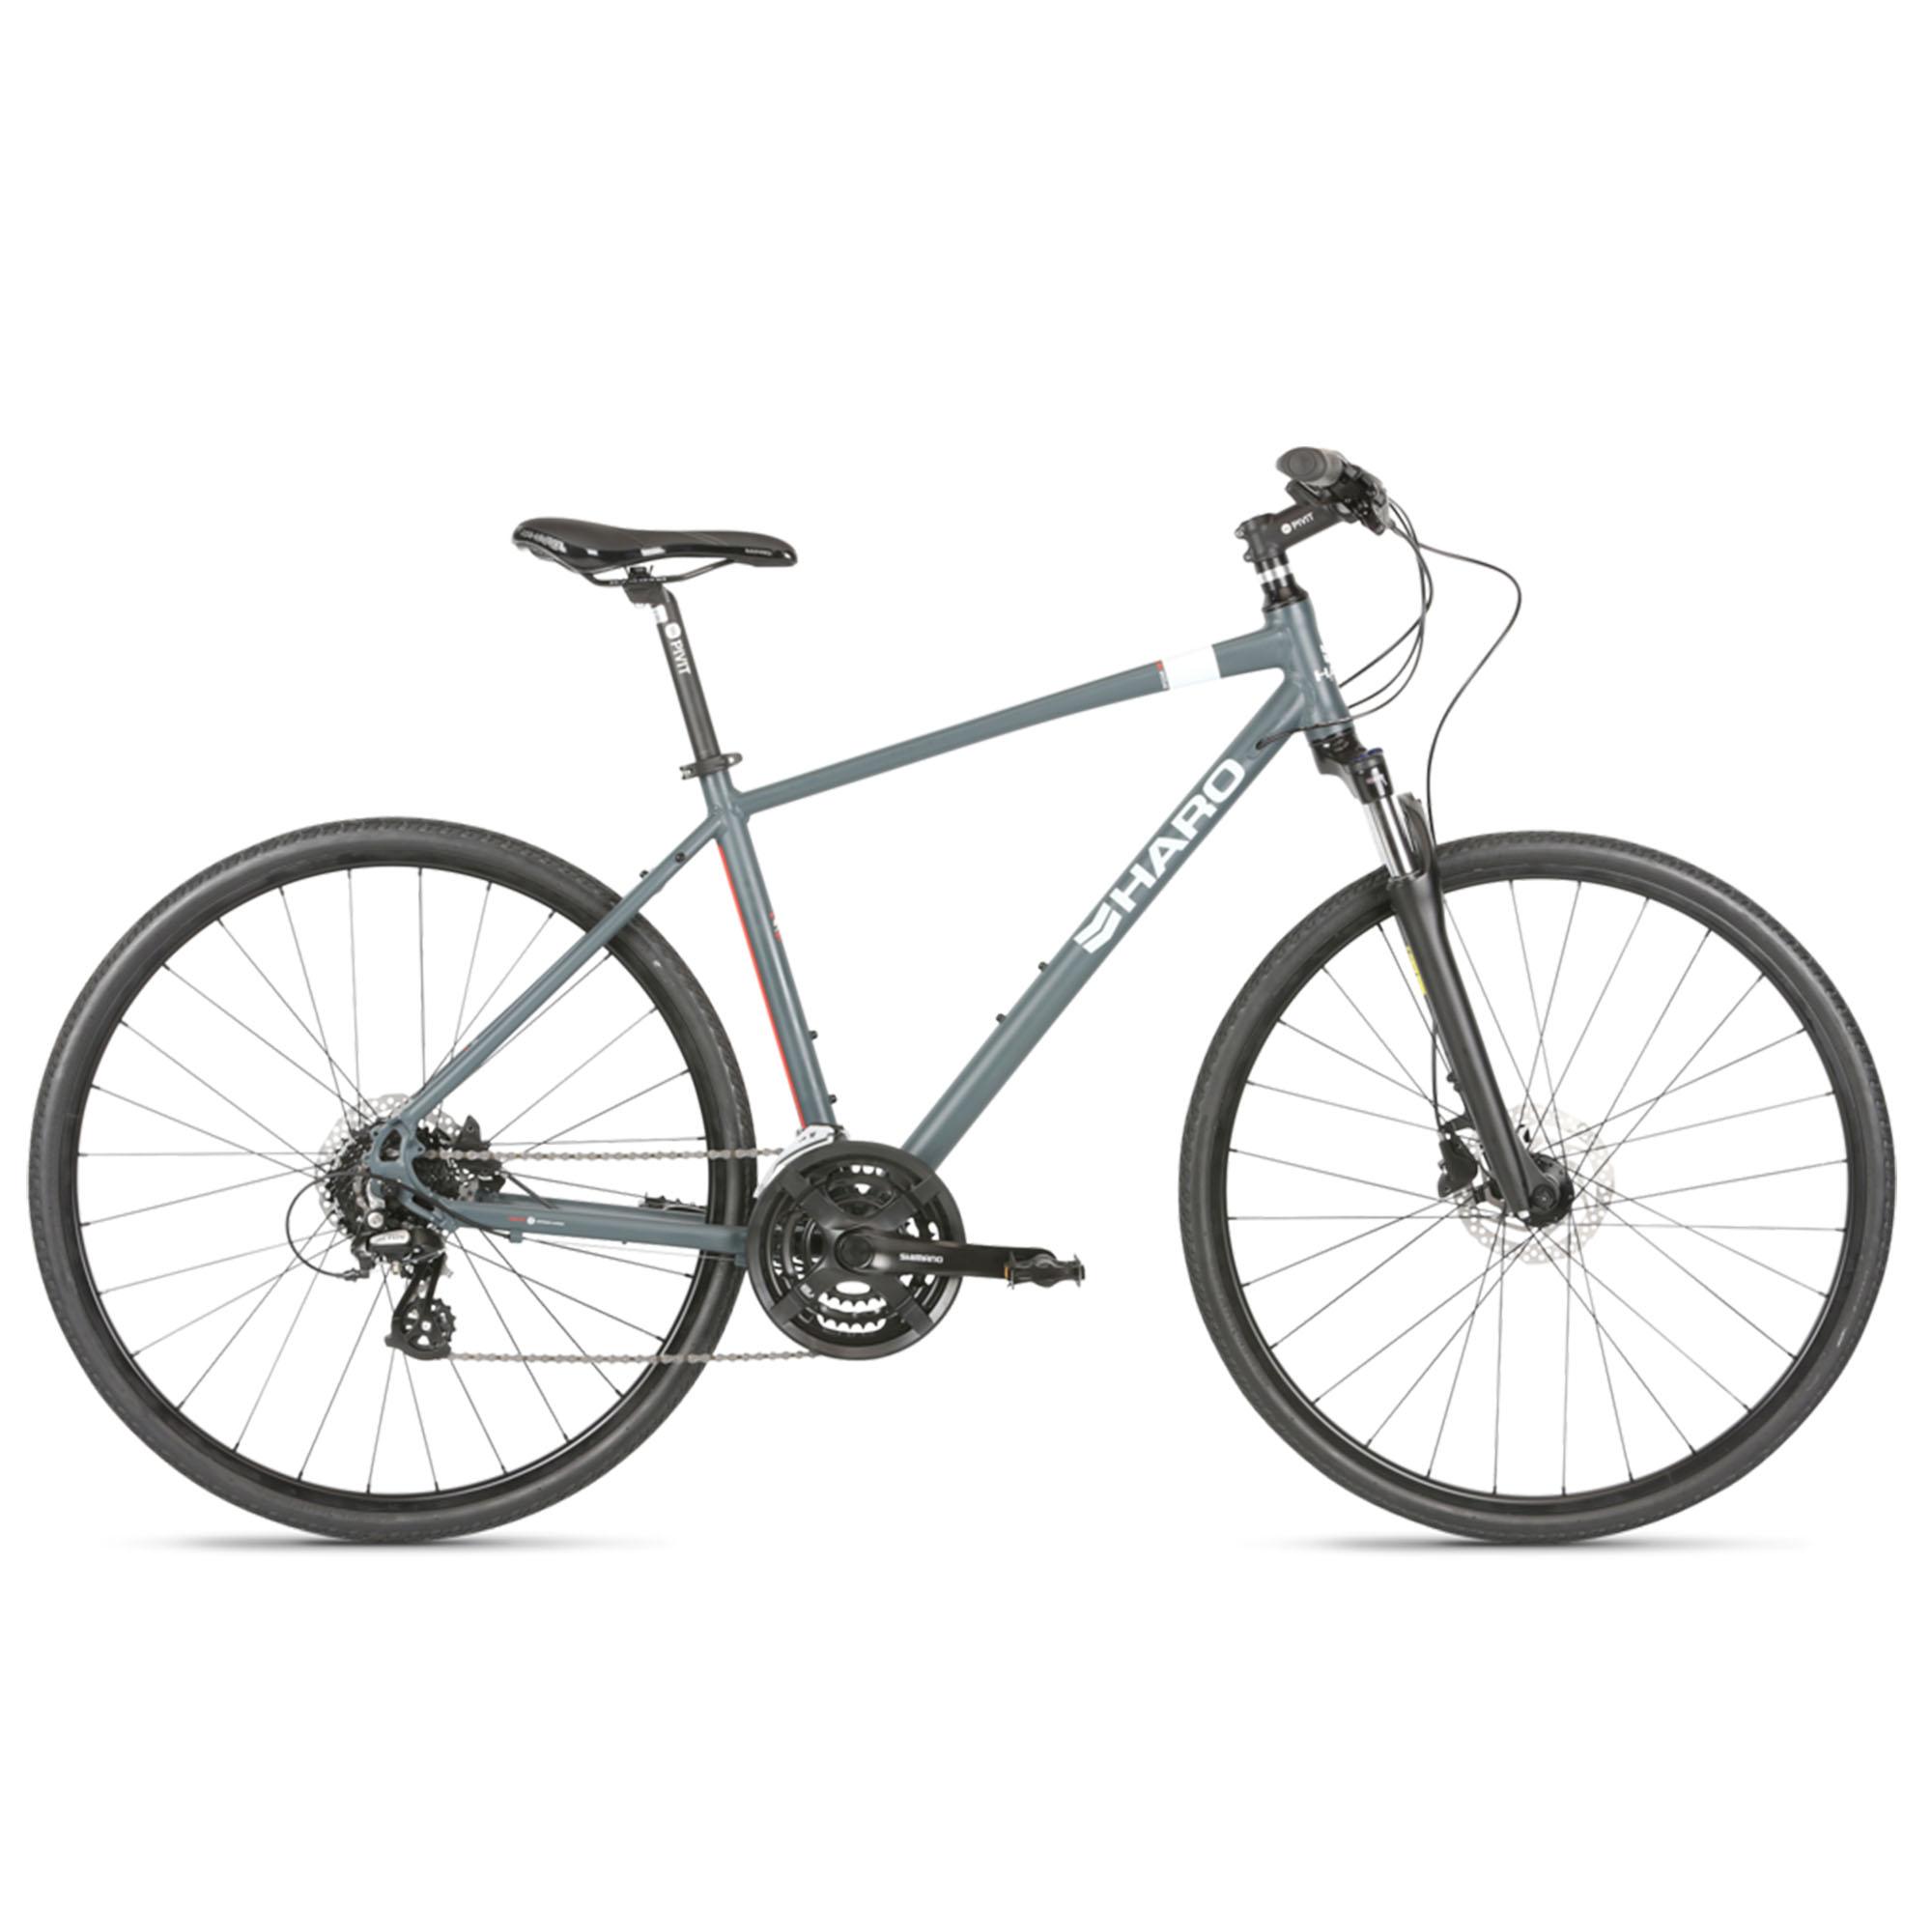 haro men u0026 39 s westlake hybrid bike  u0026 39 19